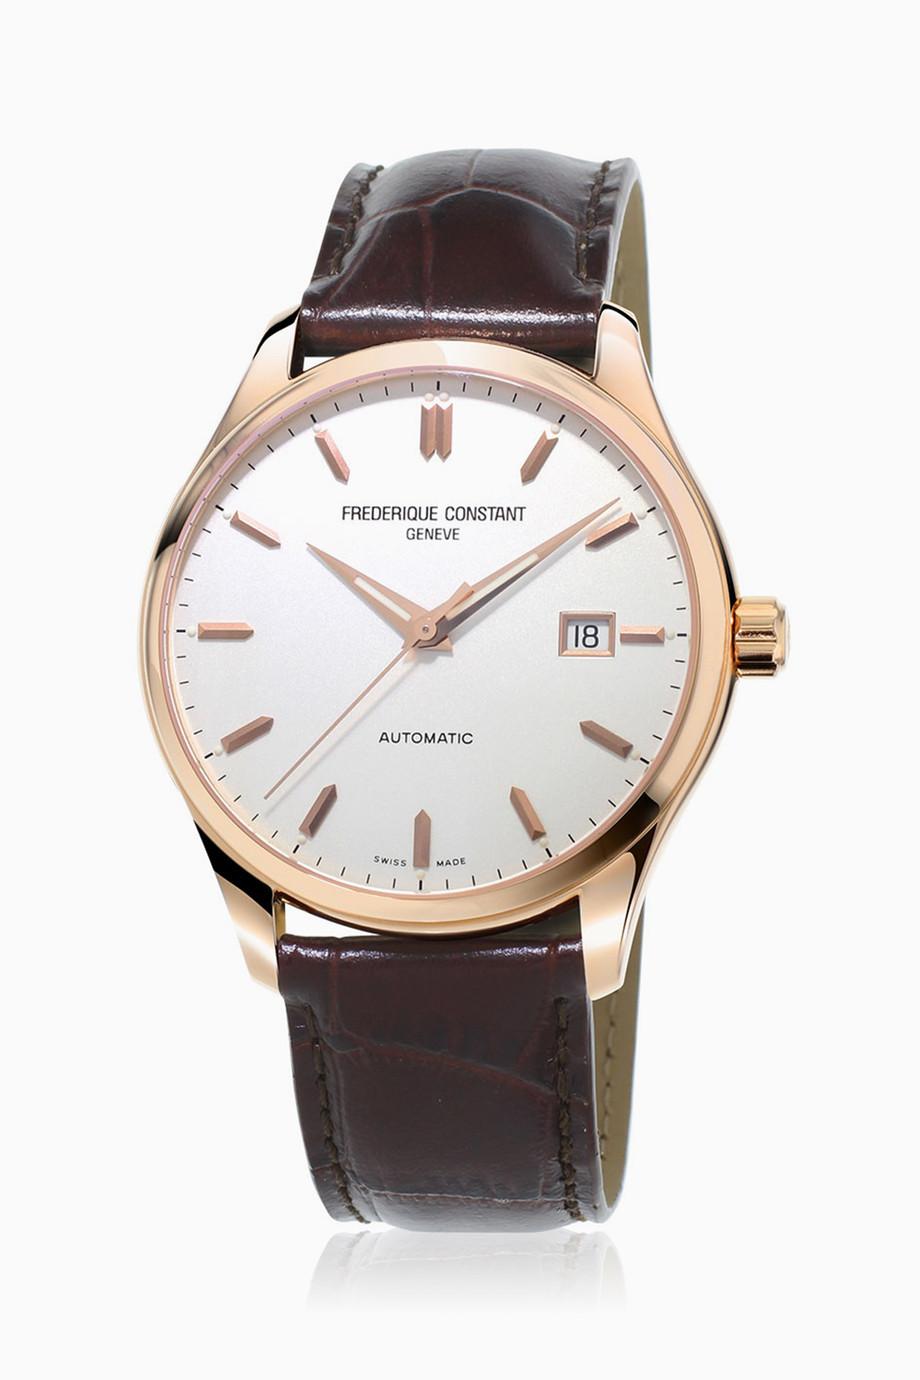 9f9c40fa1 تسوق ساعة أوتوماتيكية كلاسيكية بعلامات ساعات فريدريك كونستانت بنى ...